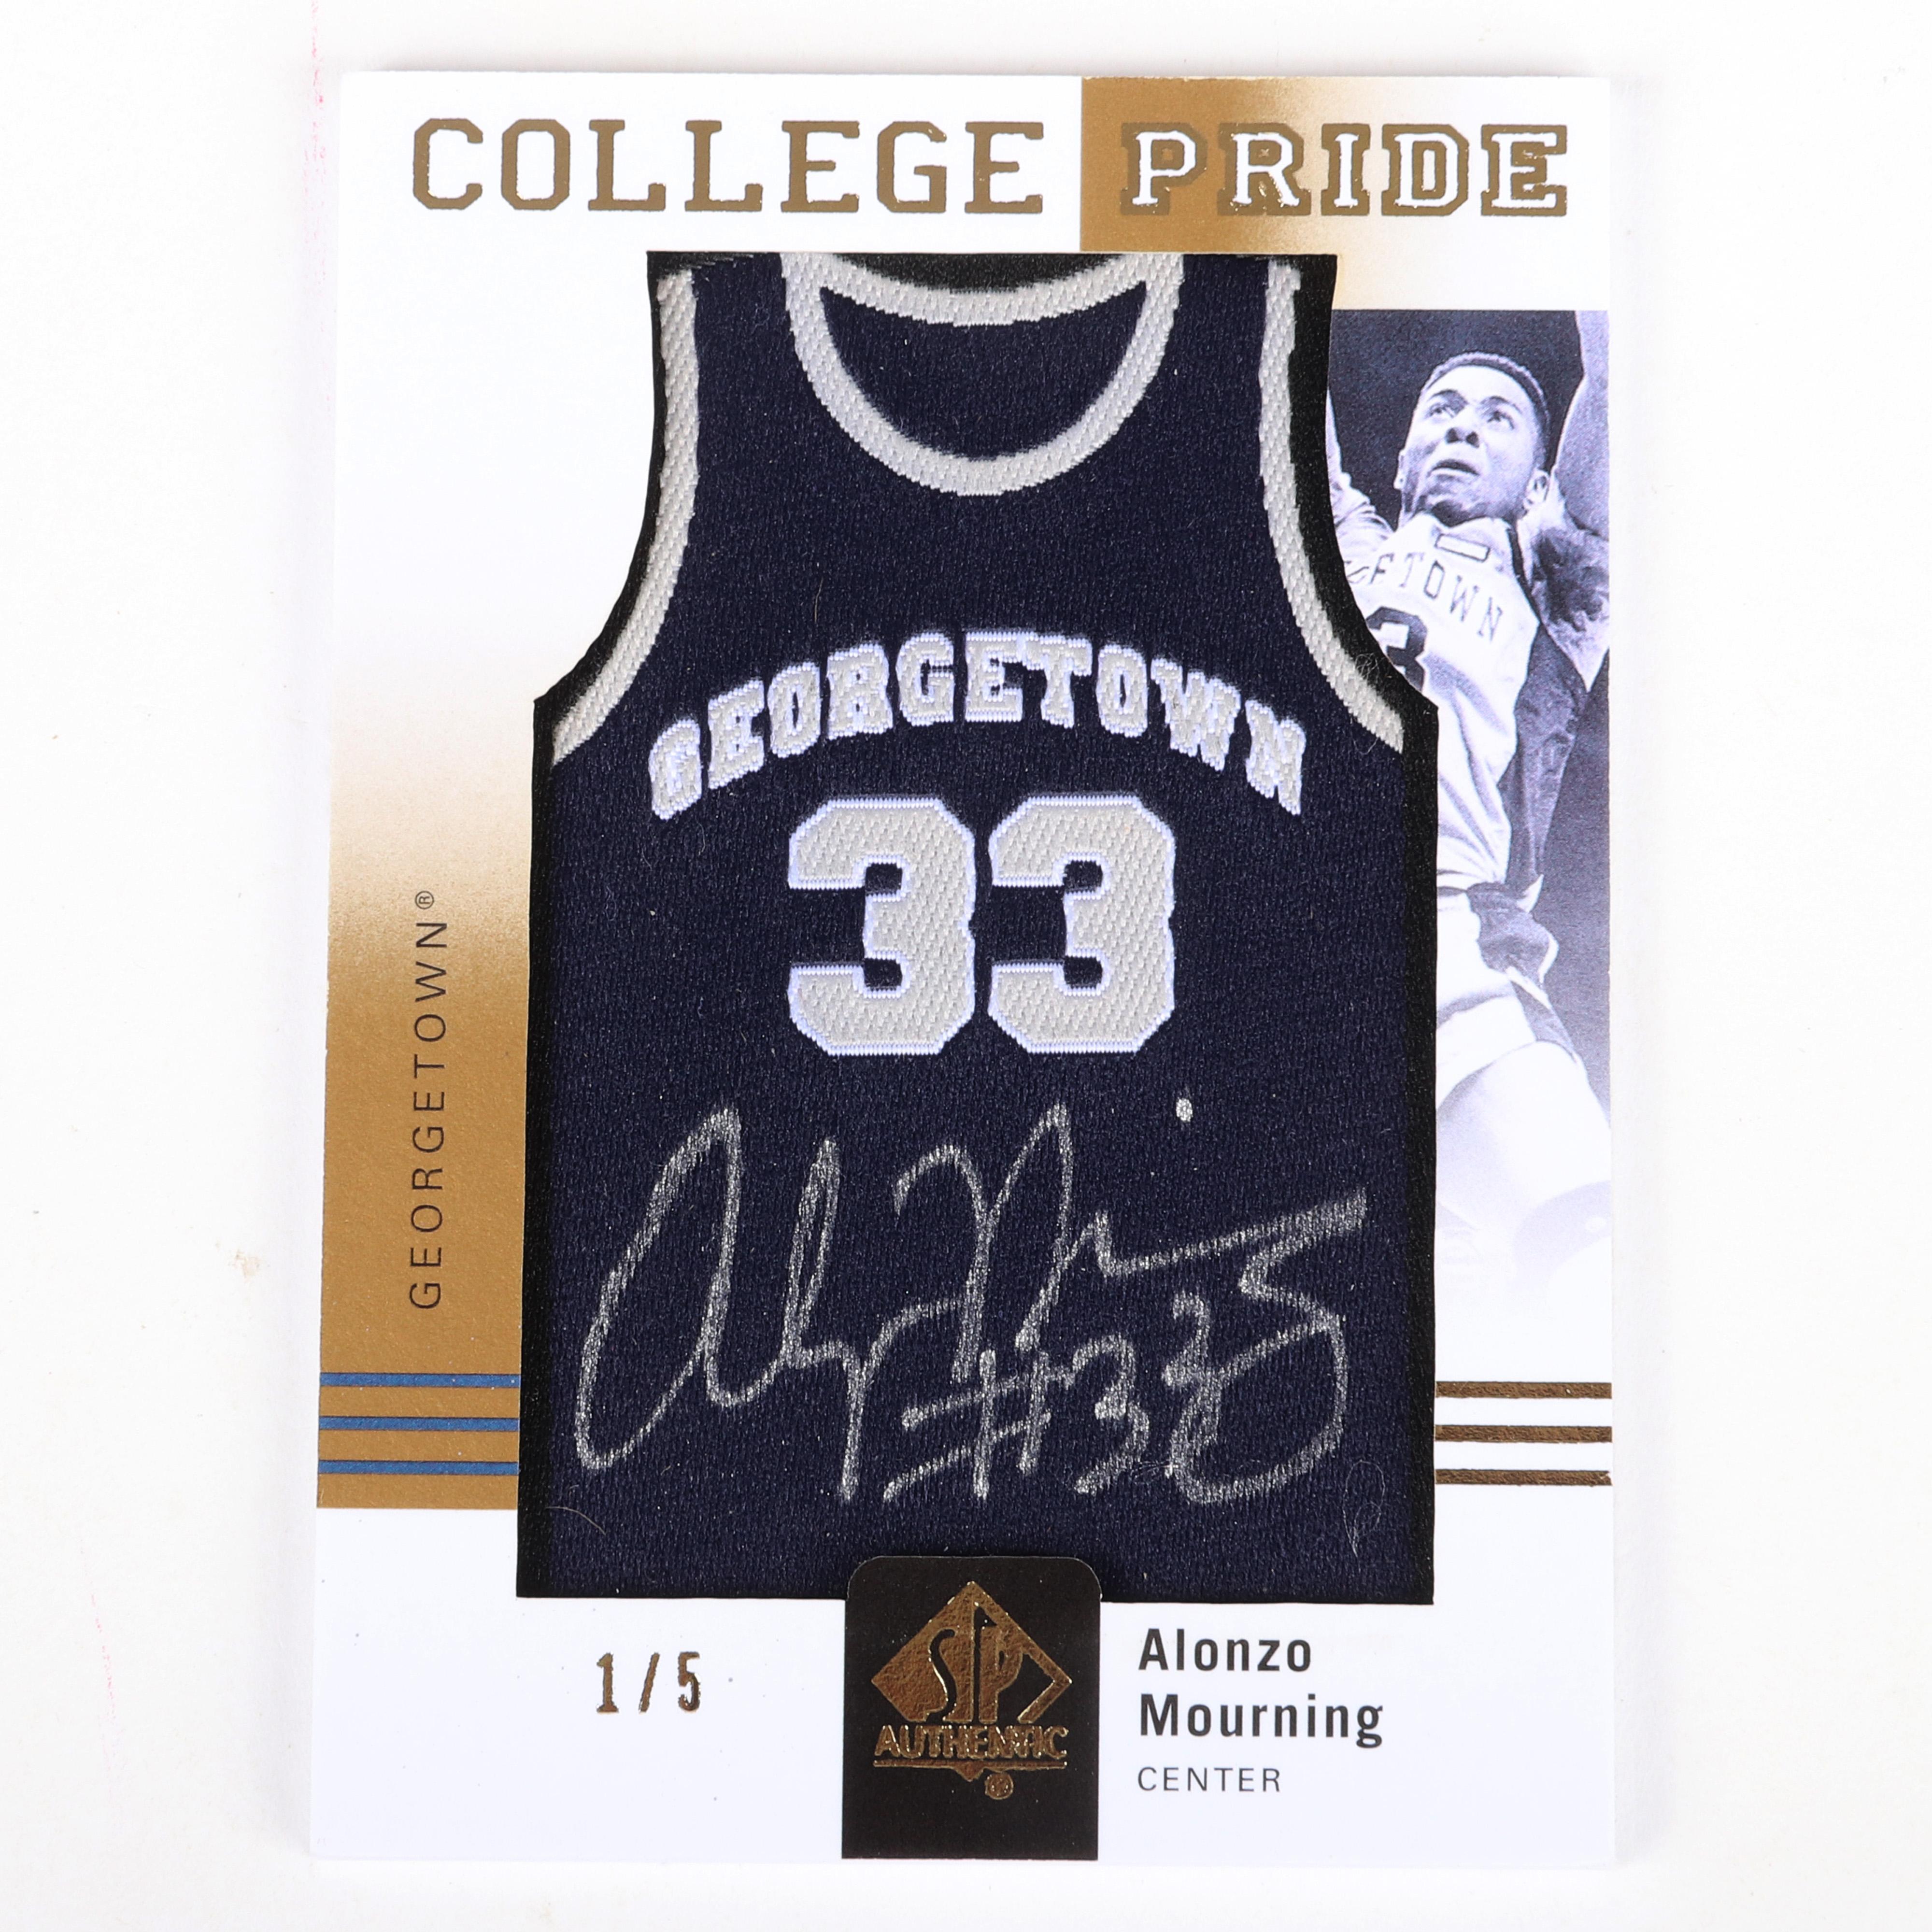 2011-12 Alonzo Mourning SP College Pride Autograph Card #CJ-AM 1/5